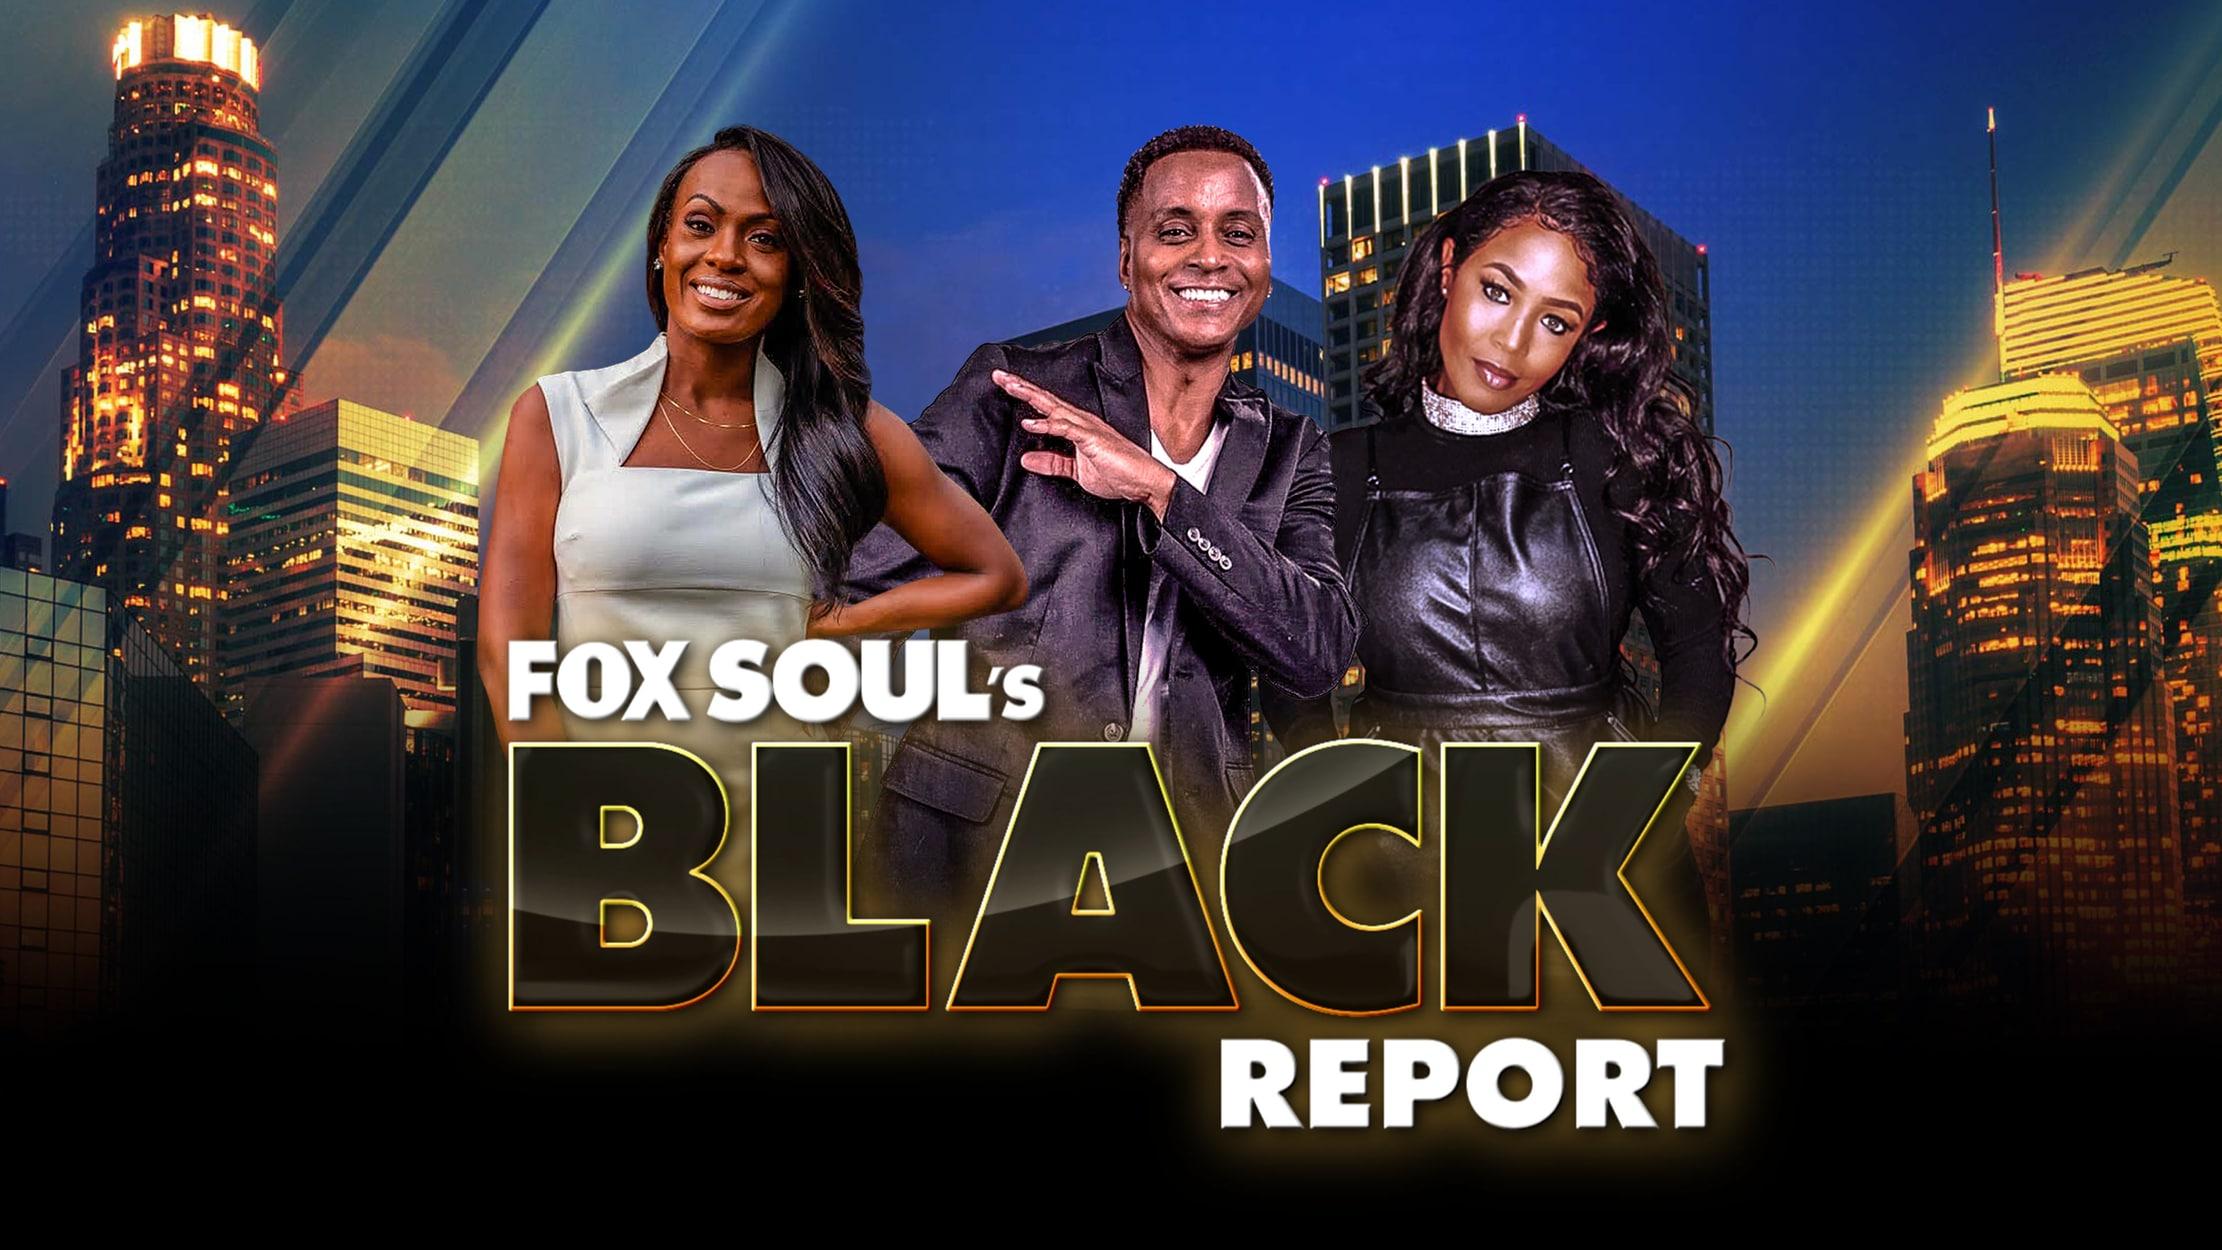 Fox Soul's Black Report seriesDetail